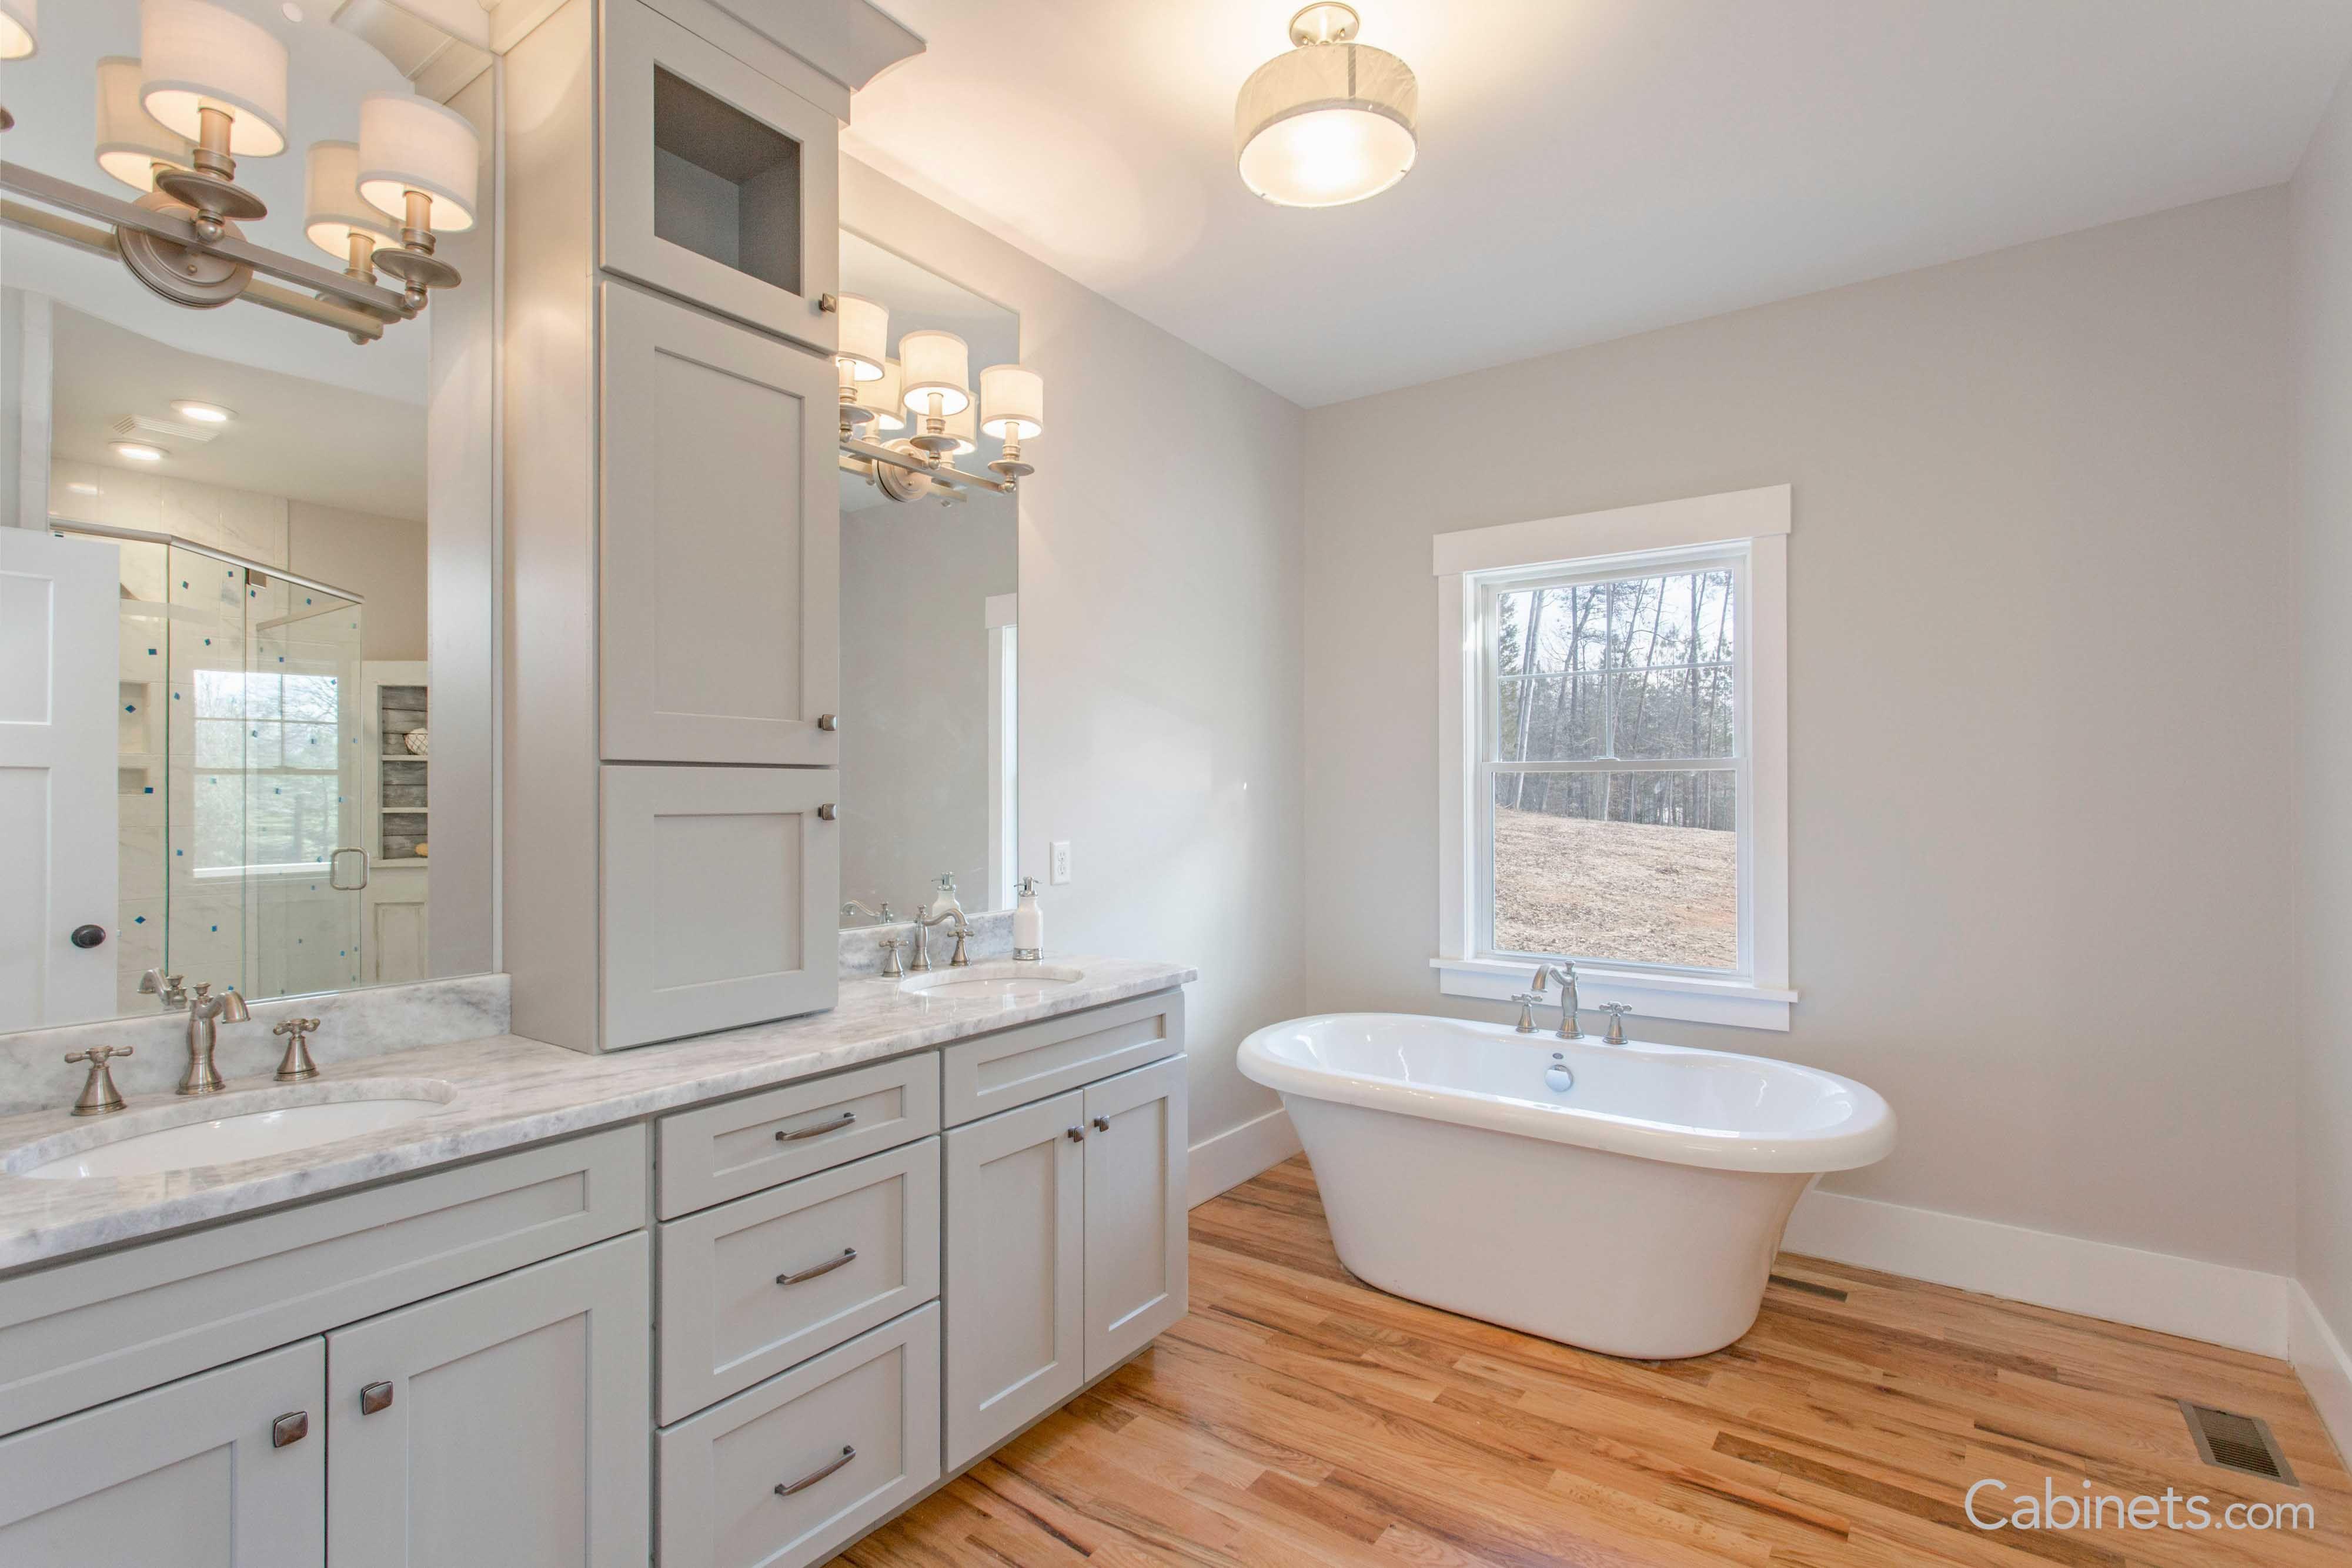 Beautiful Bathroom Vanity Ideas Cabinets Com Beautiful Bathroom Vanity Wood Floor Bathroom Bathroom Cabinets Designs